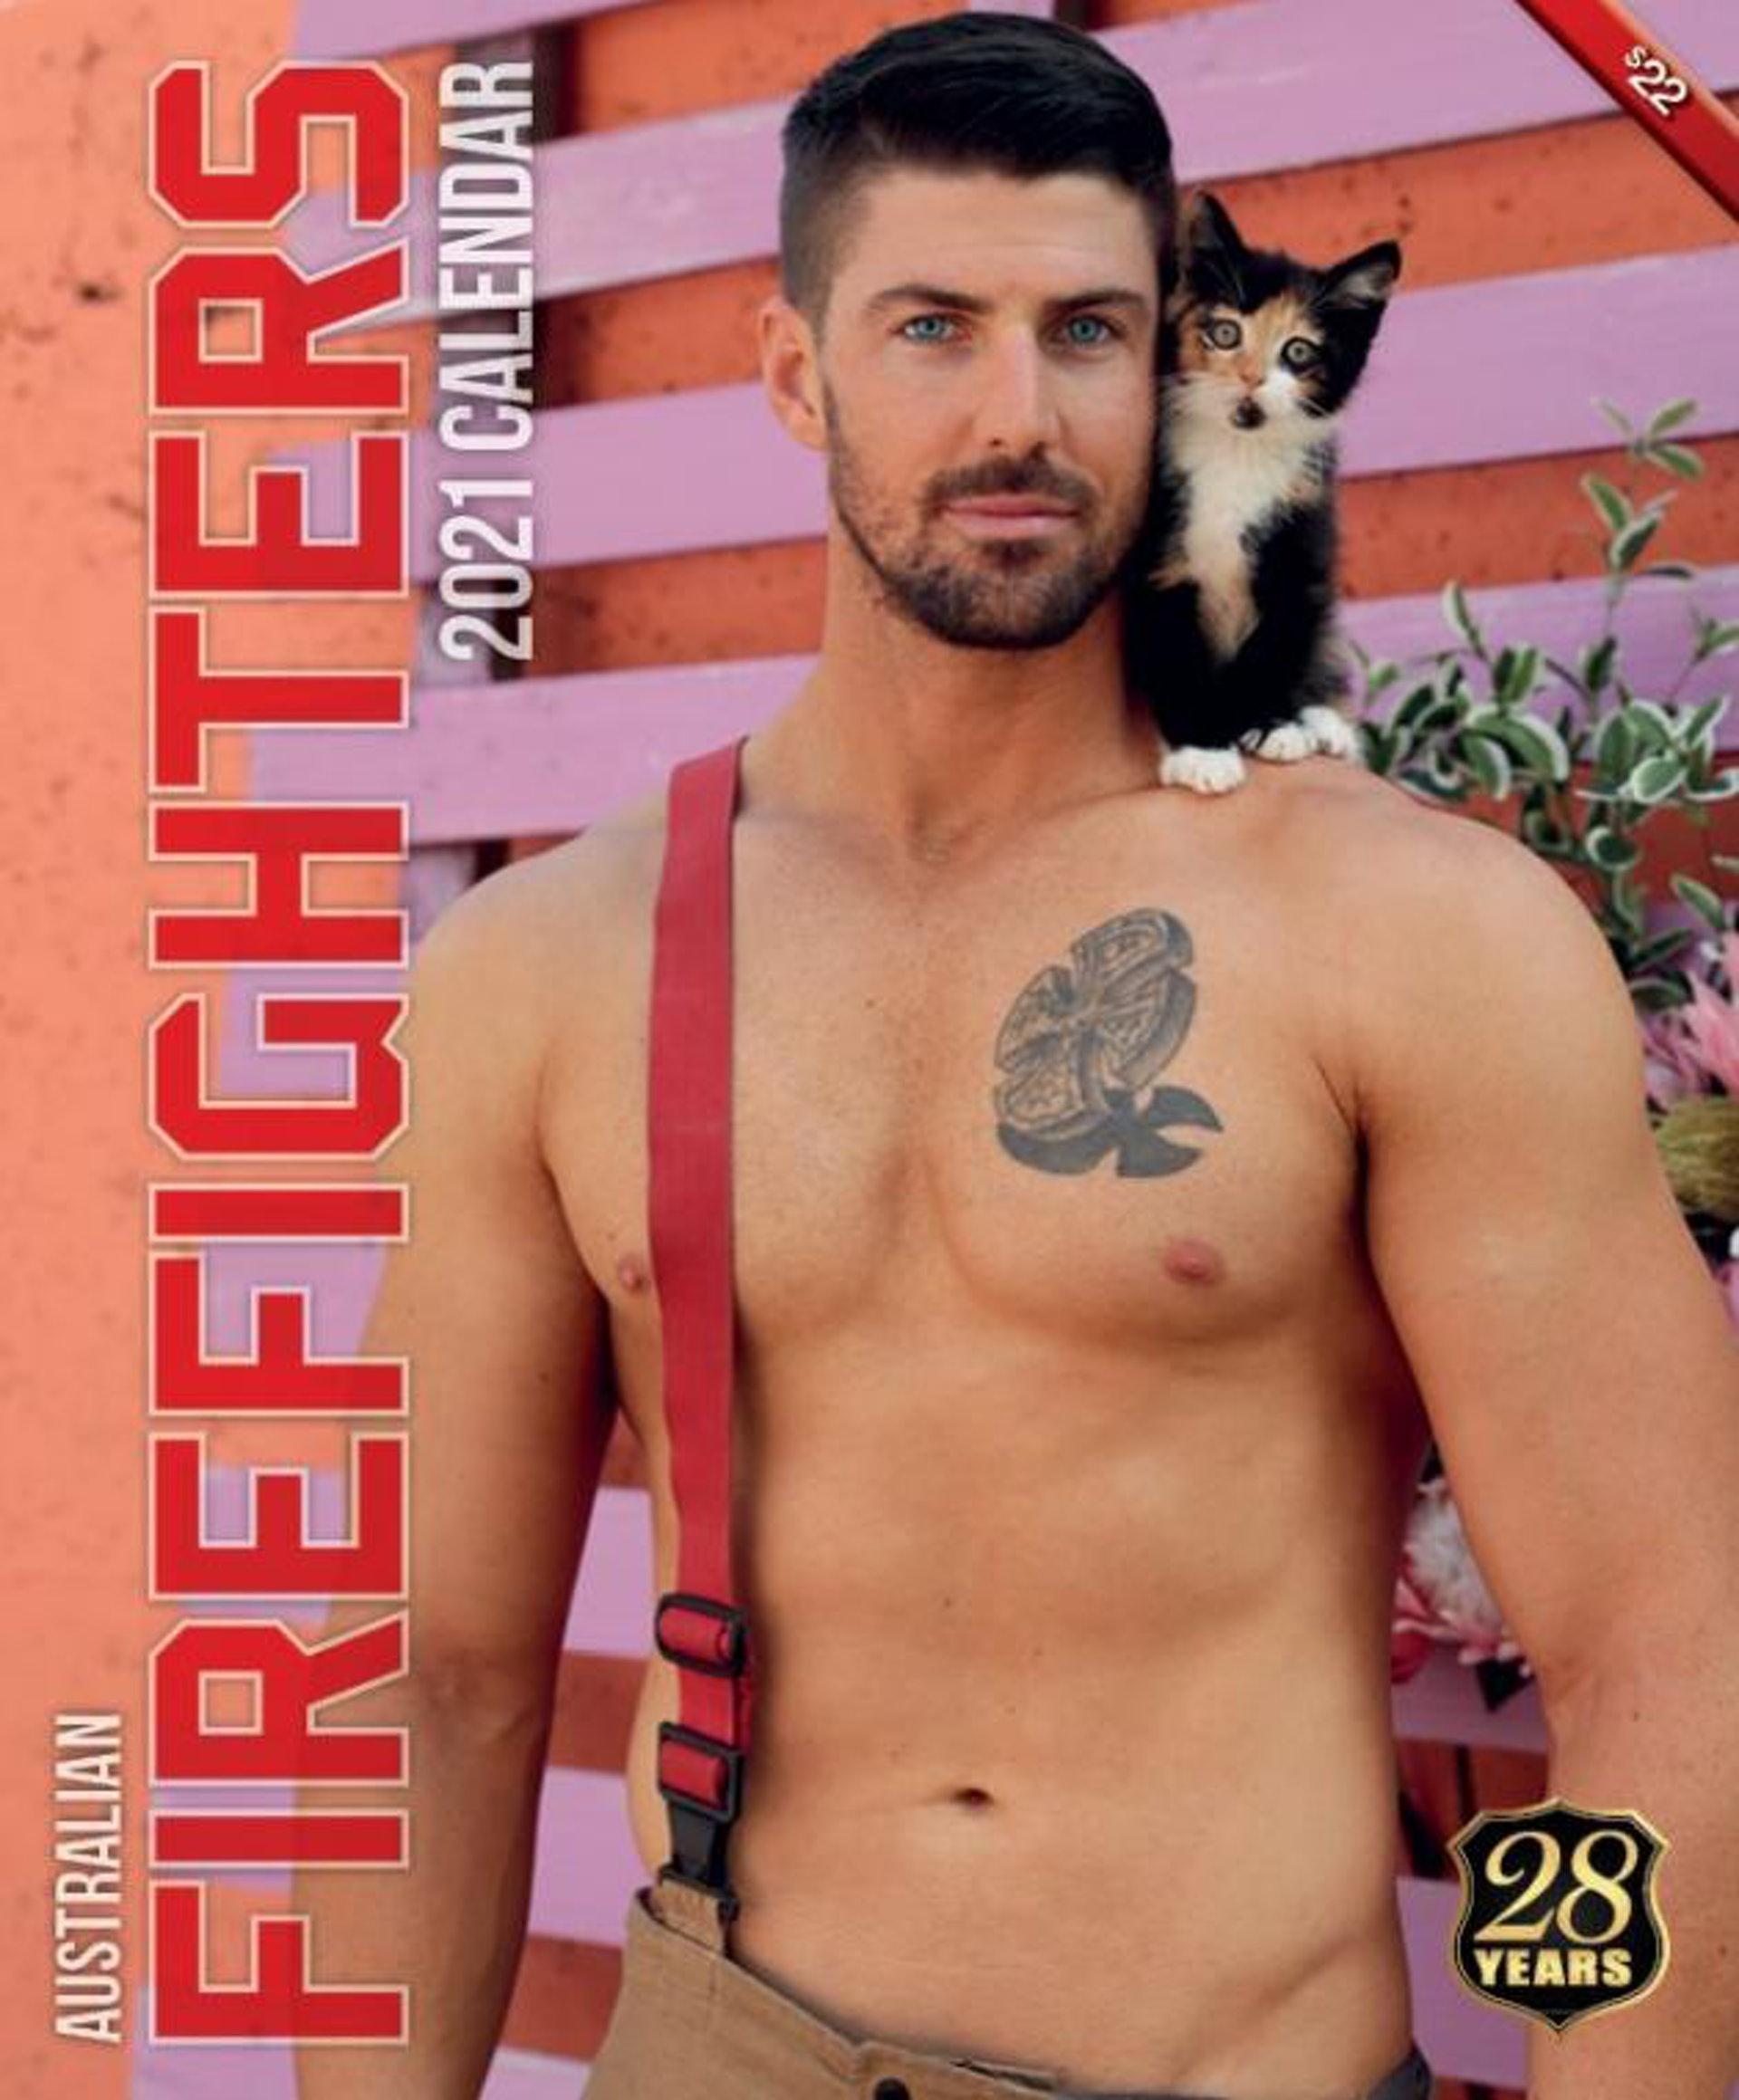 圖片來源/Australian Firefighters Calendar FB